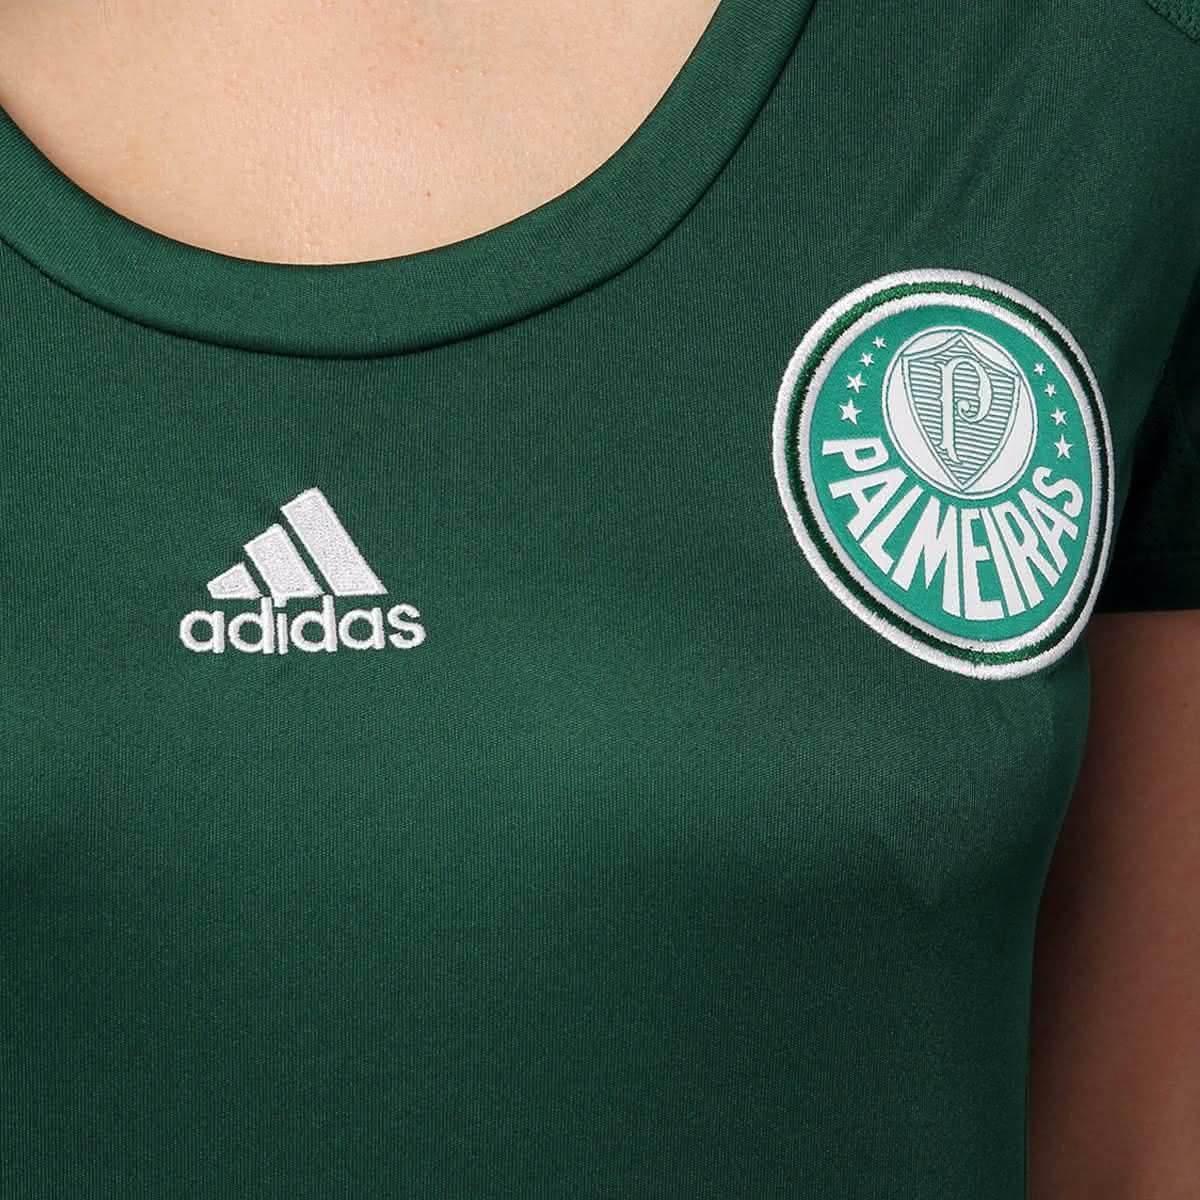 Camisa-Feminina-do-Palmeiras-1.jpg 7e4119bebacbe